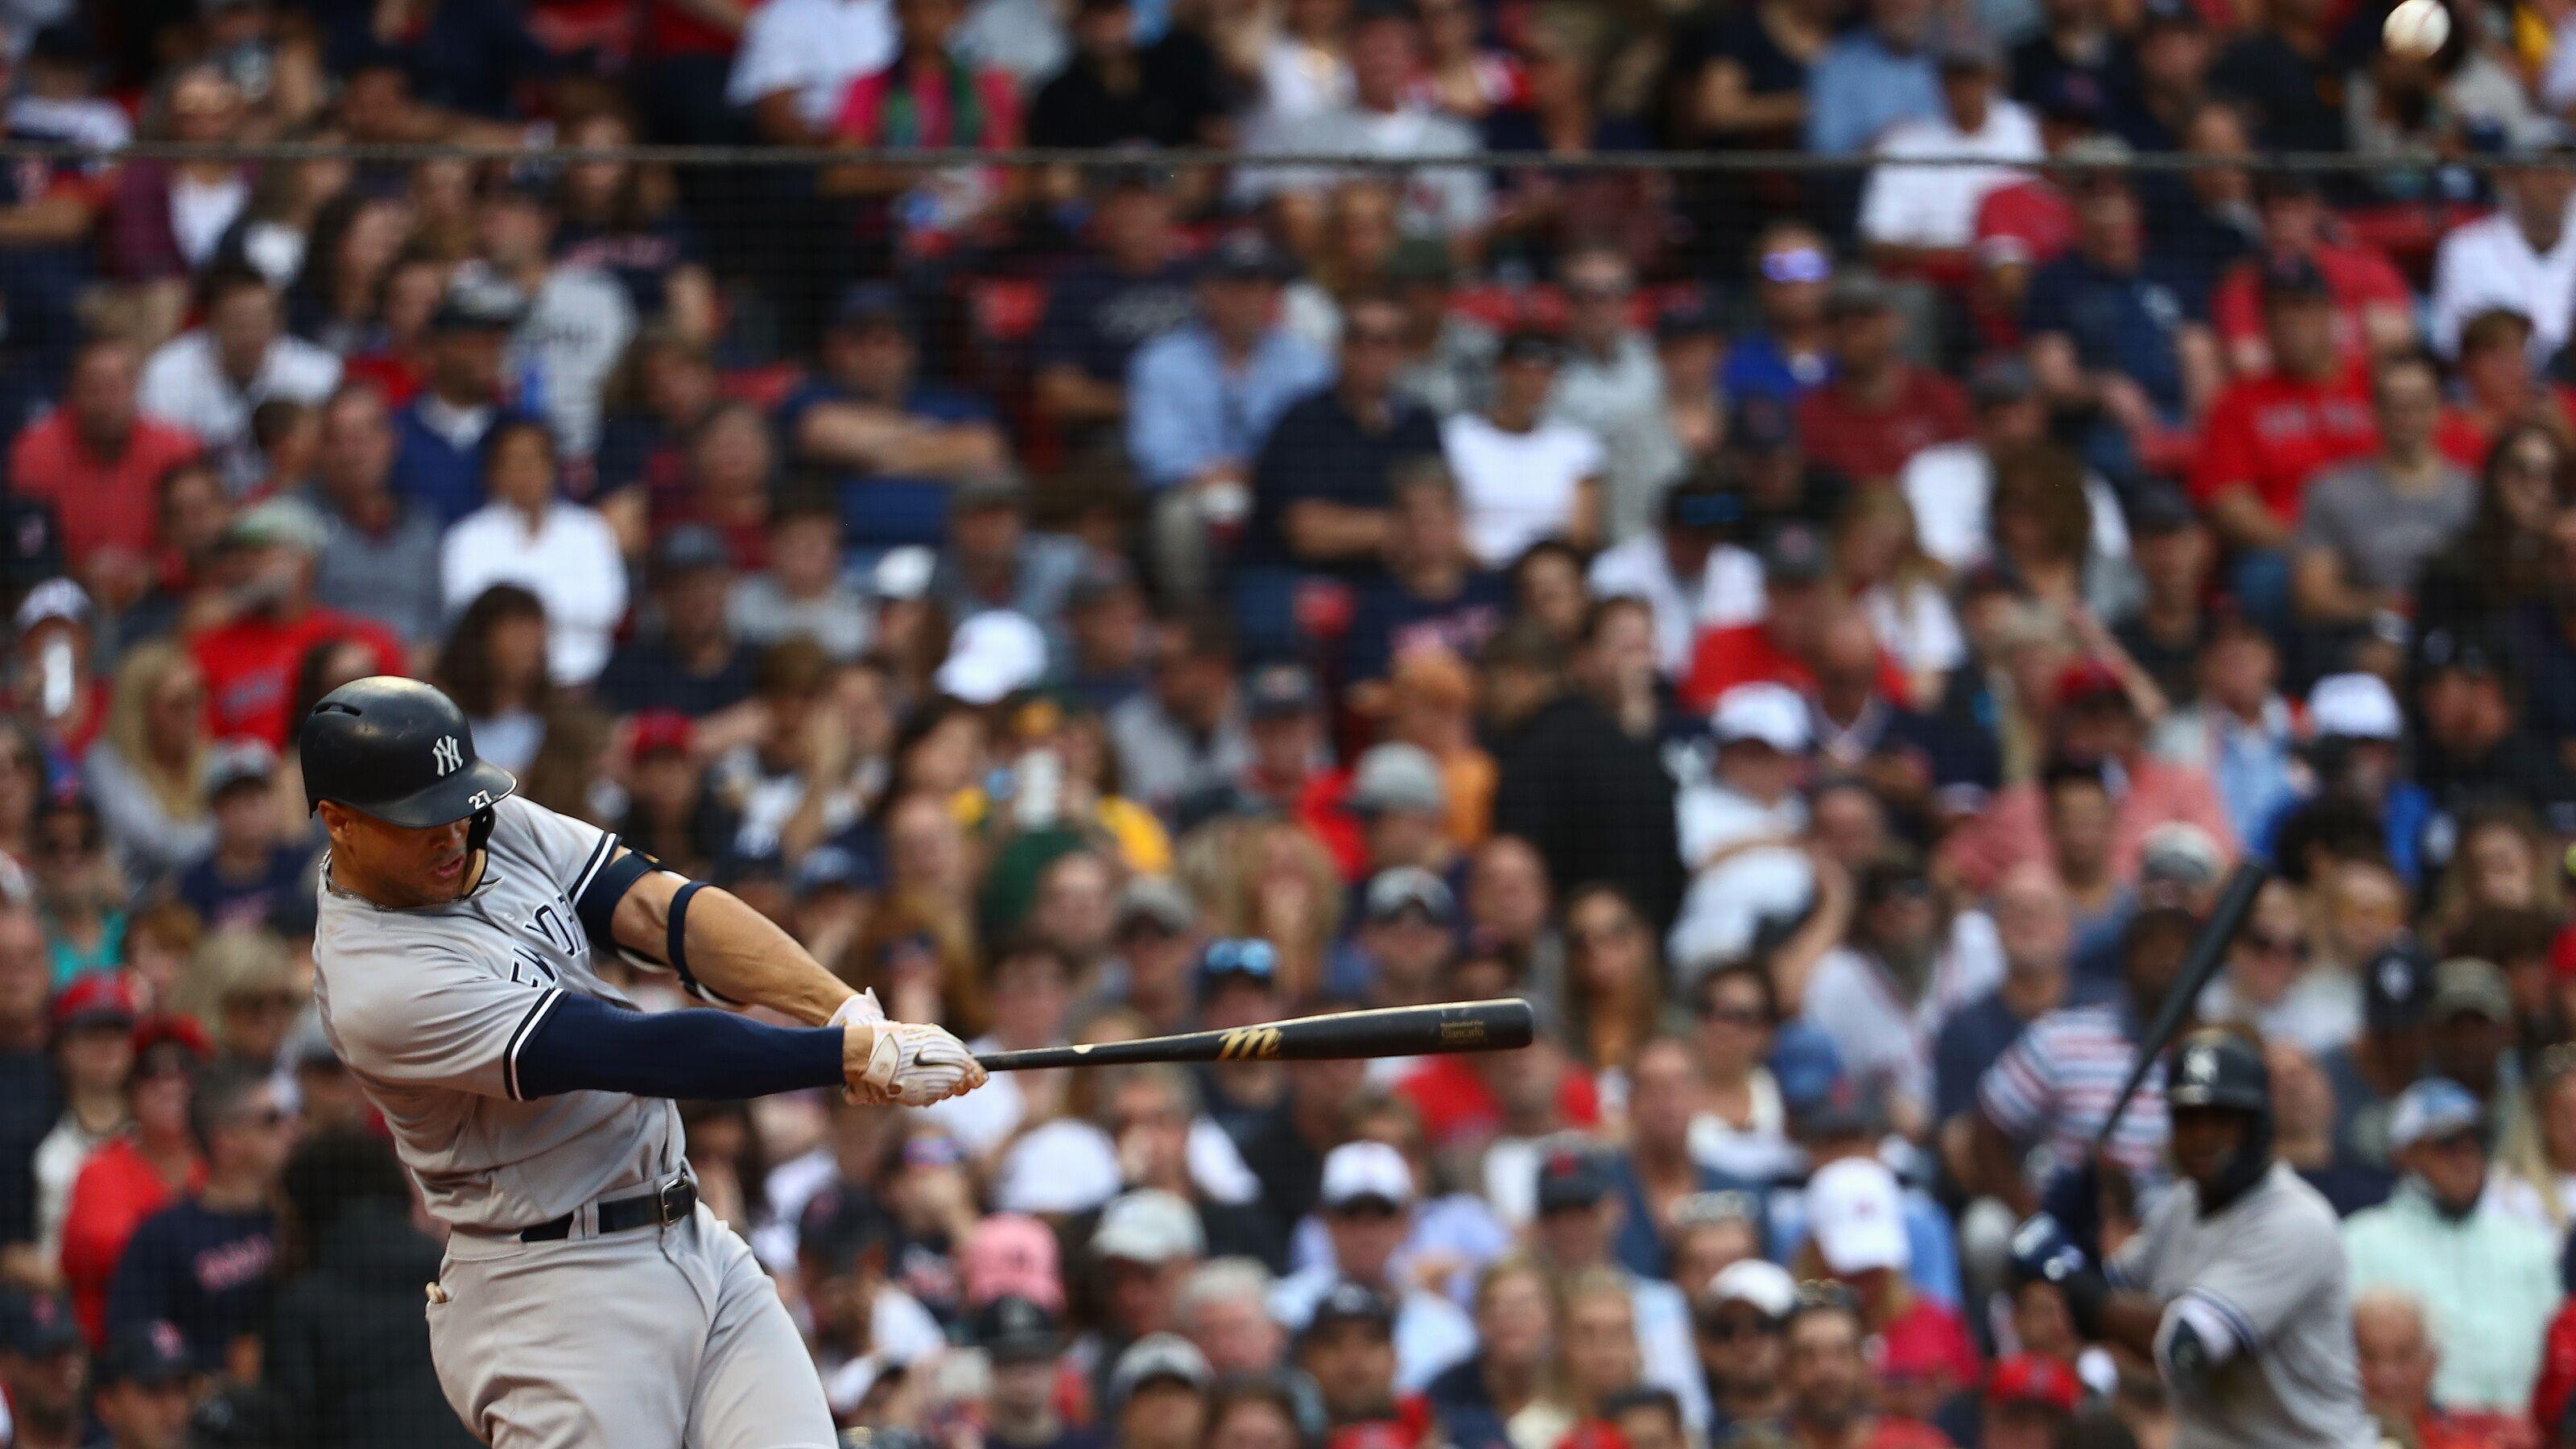 49f631ecb92 New York Yankees  Bronx Bombers hit their 265th home run to set a new single -season MLB team record